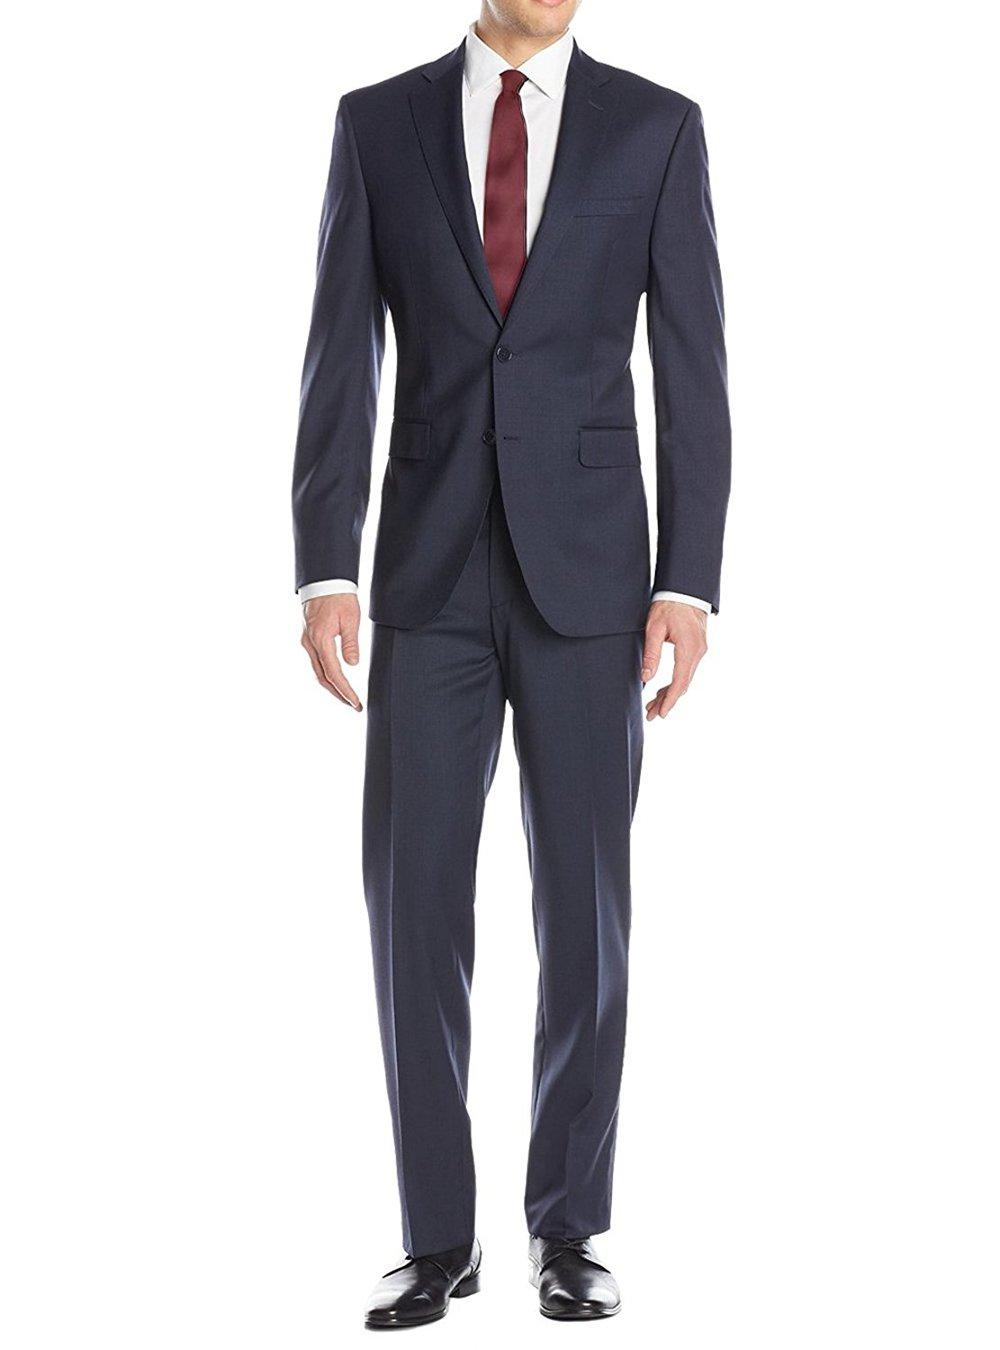 Luciano Natazzi Men's Birdseye Suit 2 Button Modern Fit Jacket Flat Front Pant (52 Regular US / 62R EU / W 46'', french blue)